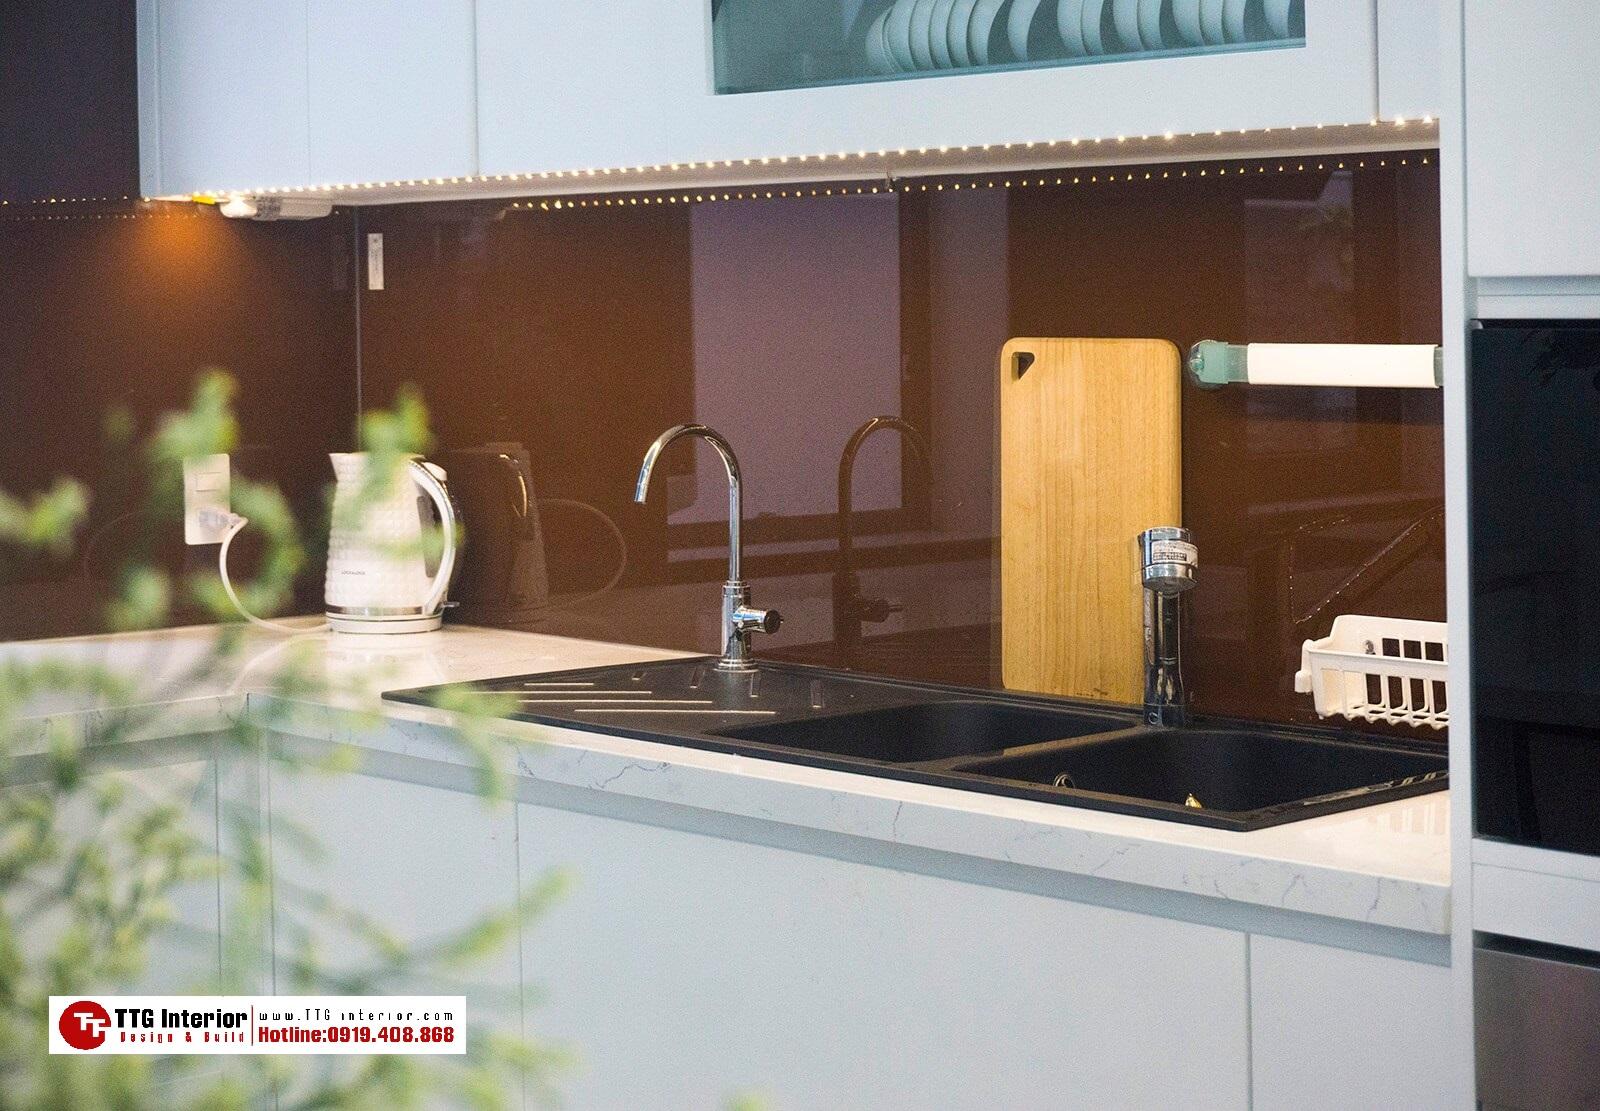 Thiết bị bếp Bosch, Malloca, Cleansui